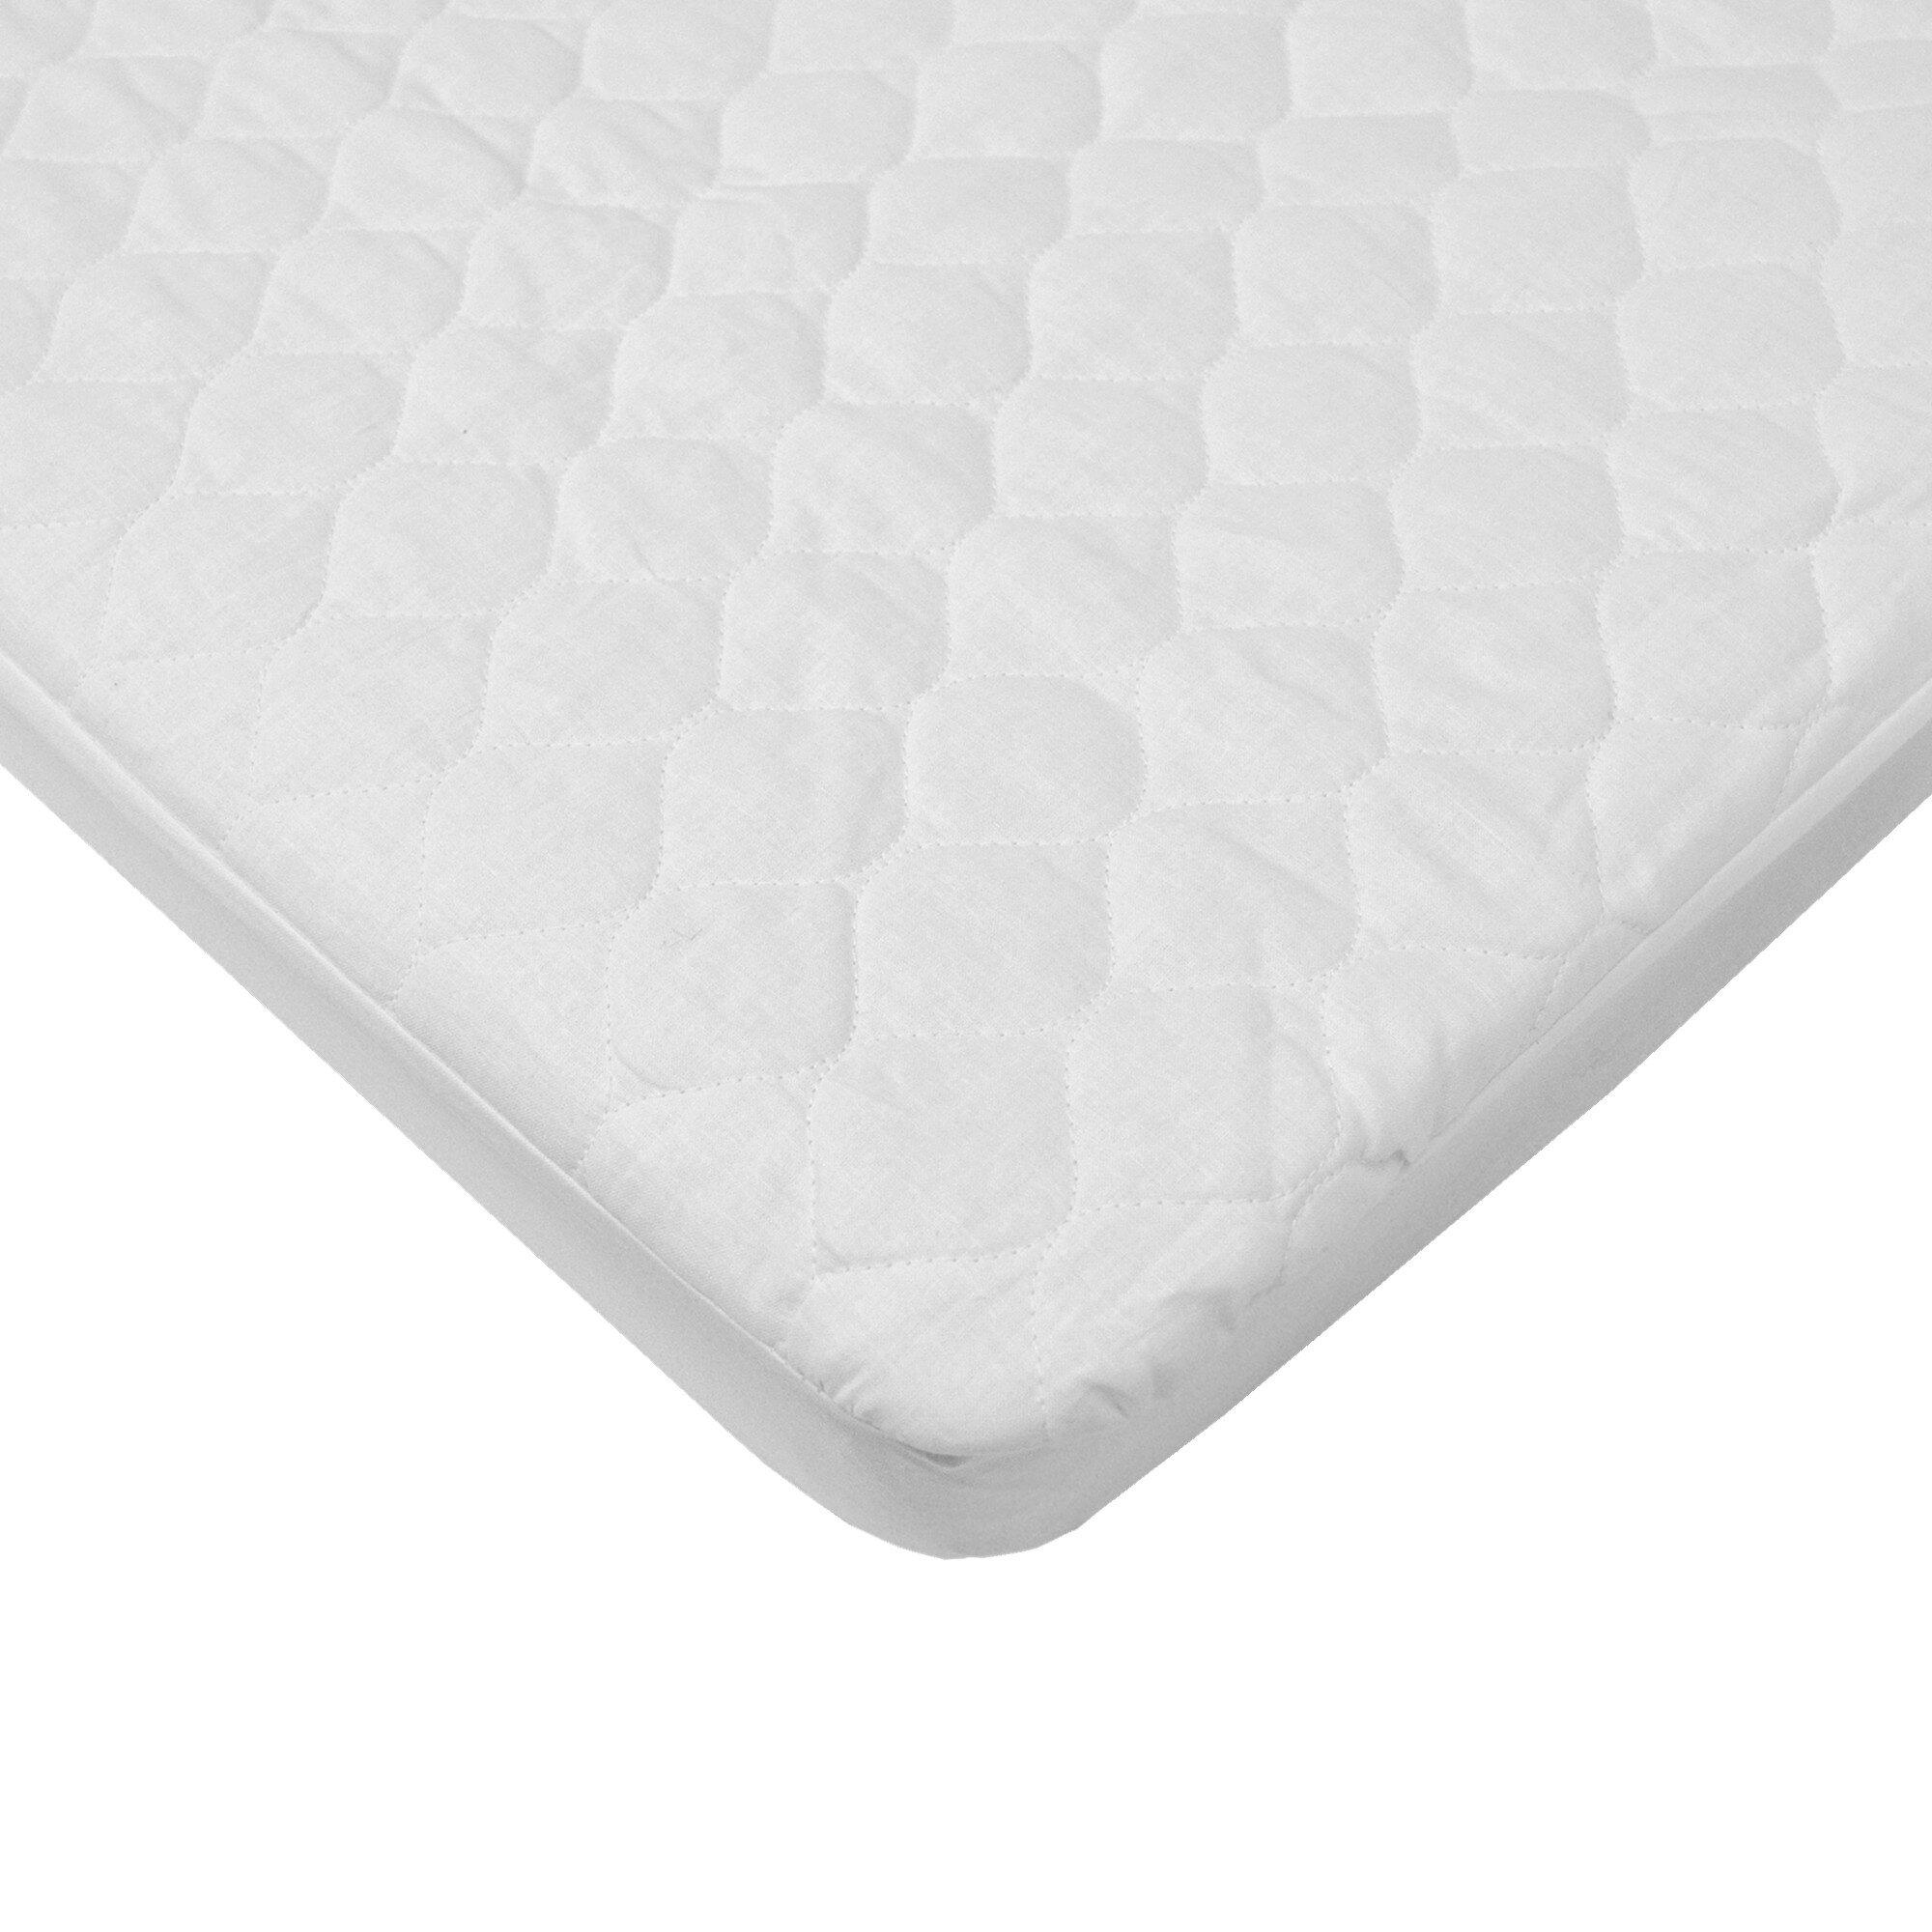 Crib mattress - American Baby Company Waterproof Quilted Mini Crib Mattress Pad